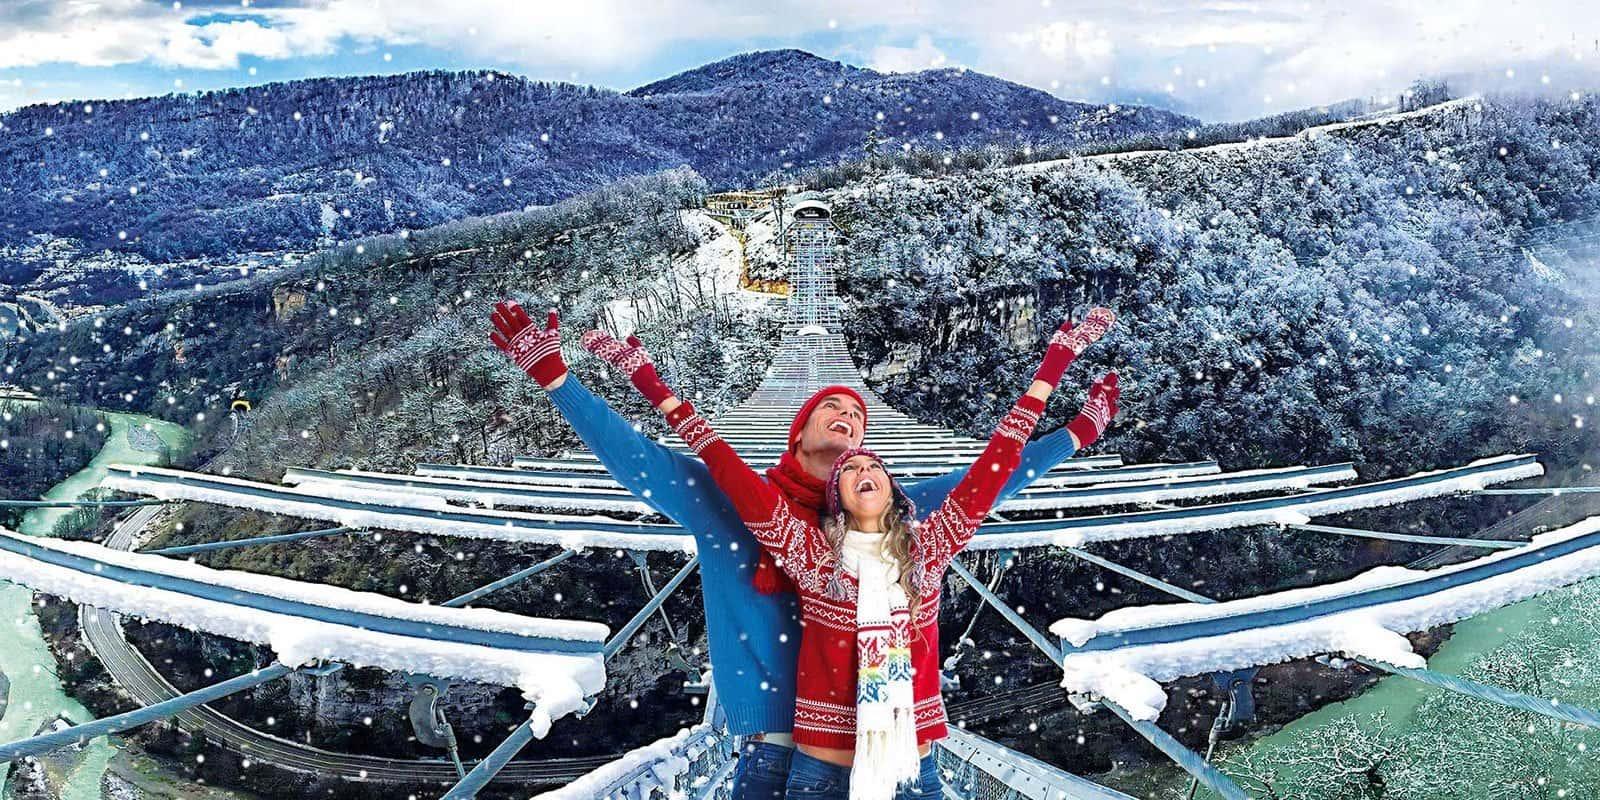 Skypark Sochi